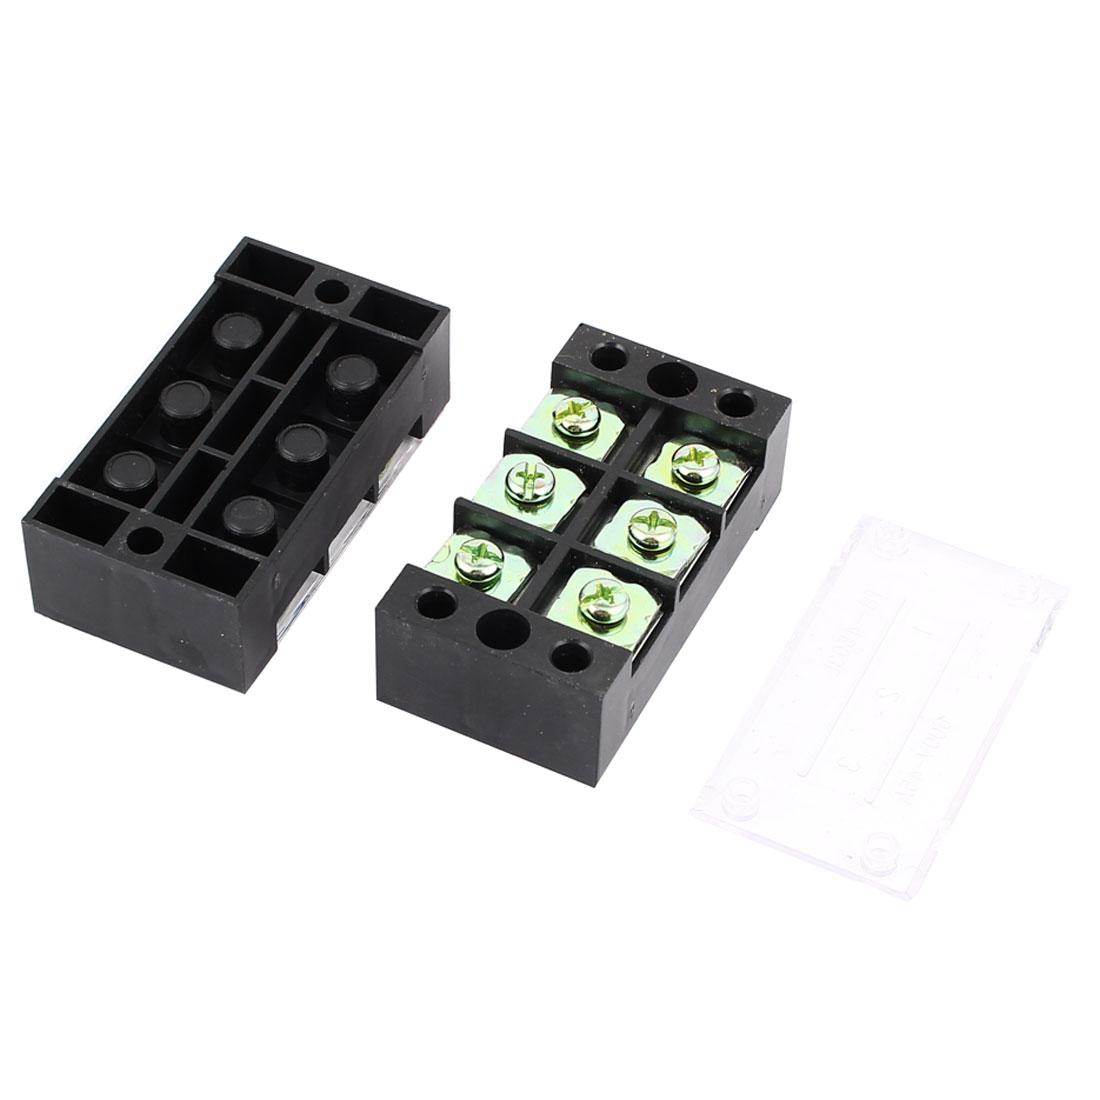 2 Pcs 600V 45A Double Row 3 Position Screw Terminal Barrier Blocks TB4503